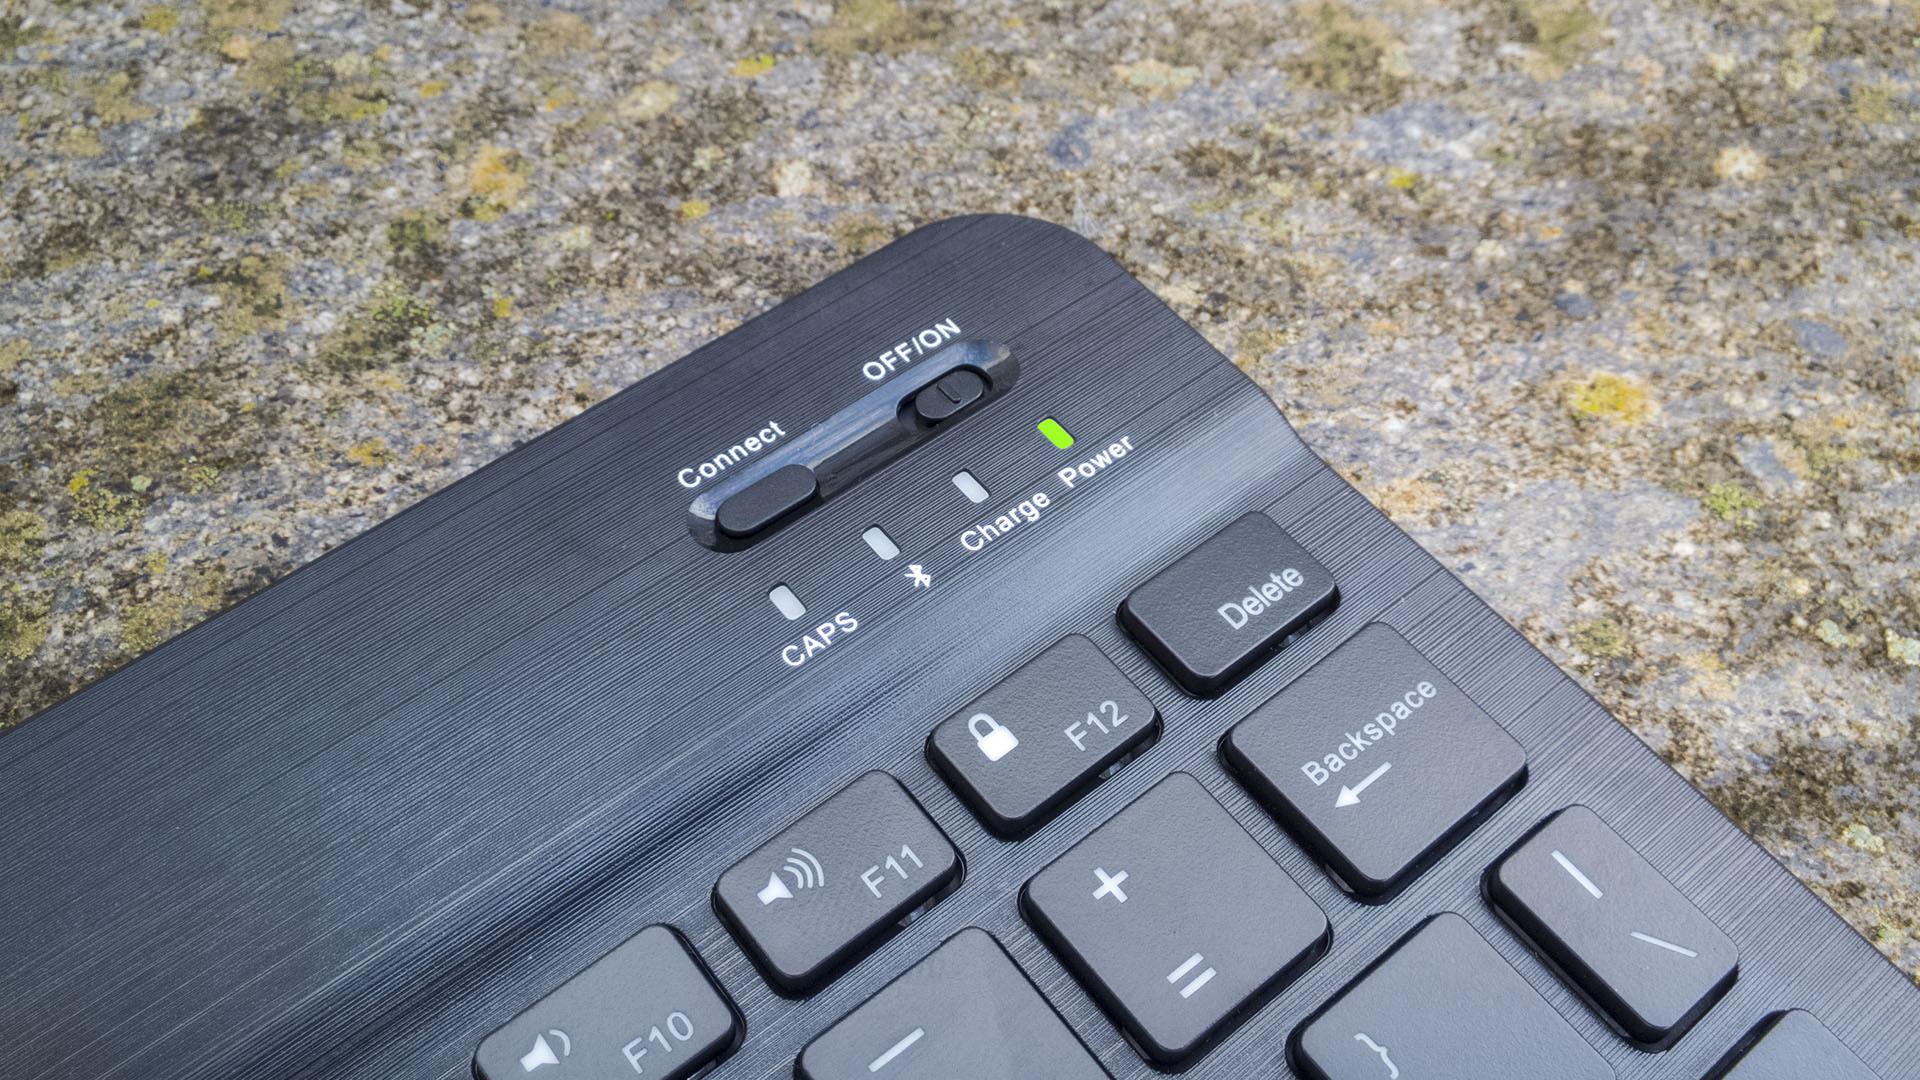 Tastiera Bluetooth iClever per Windows, iOS, Android (4)